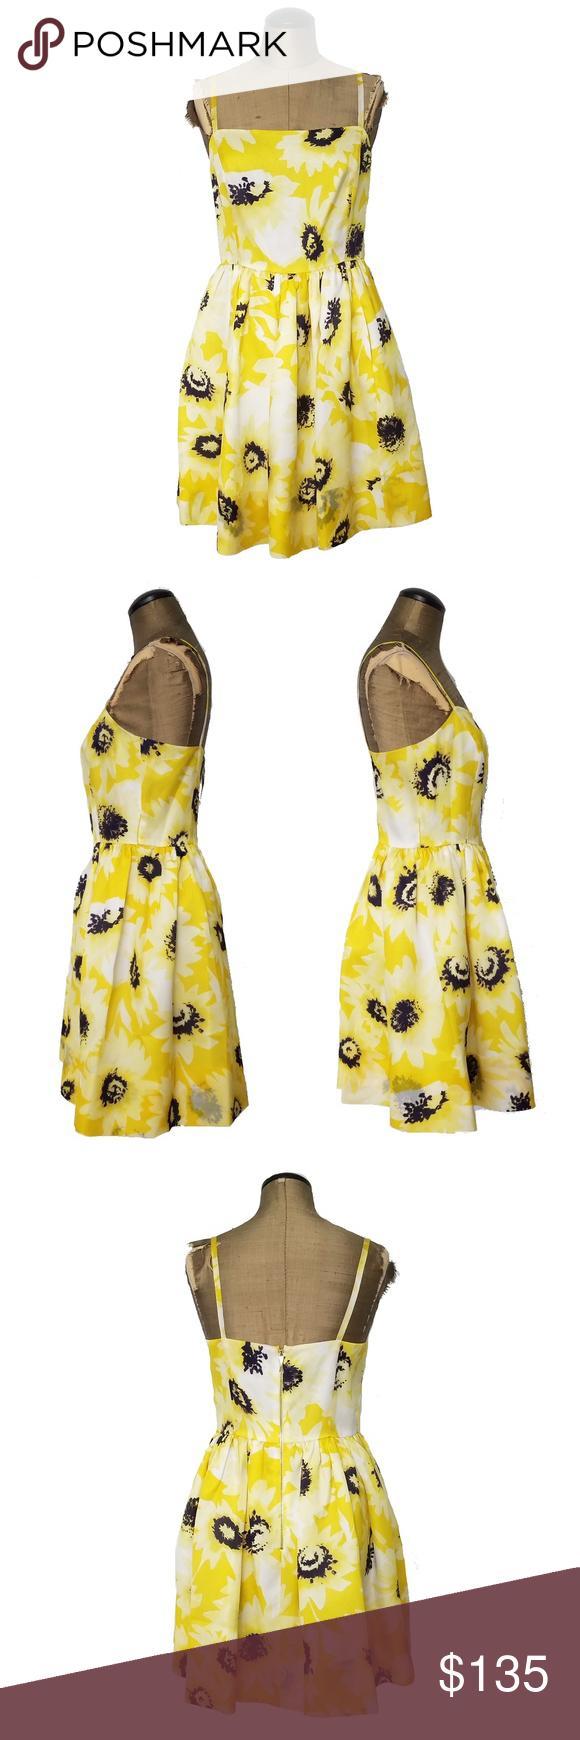 Kate Spade Sunflower Yellow Black Mini Dress Sz 4 Kate Spade Dress Sz 4 Sunflower Pattern New With Tags Missing B Mini Black Dress Fashion Clothes Design [ 1740 x 580 Pixel ]